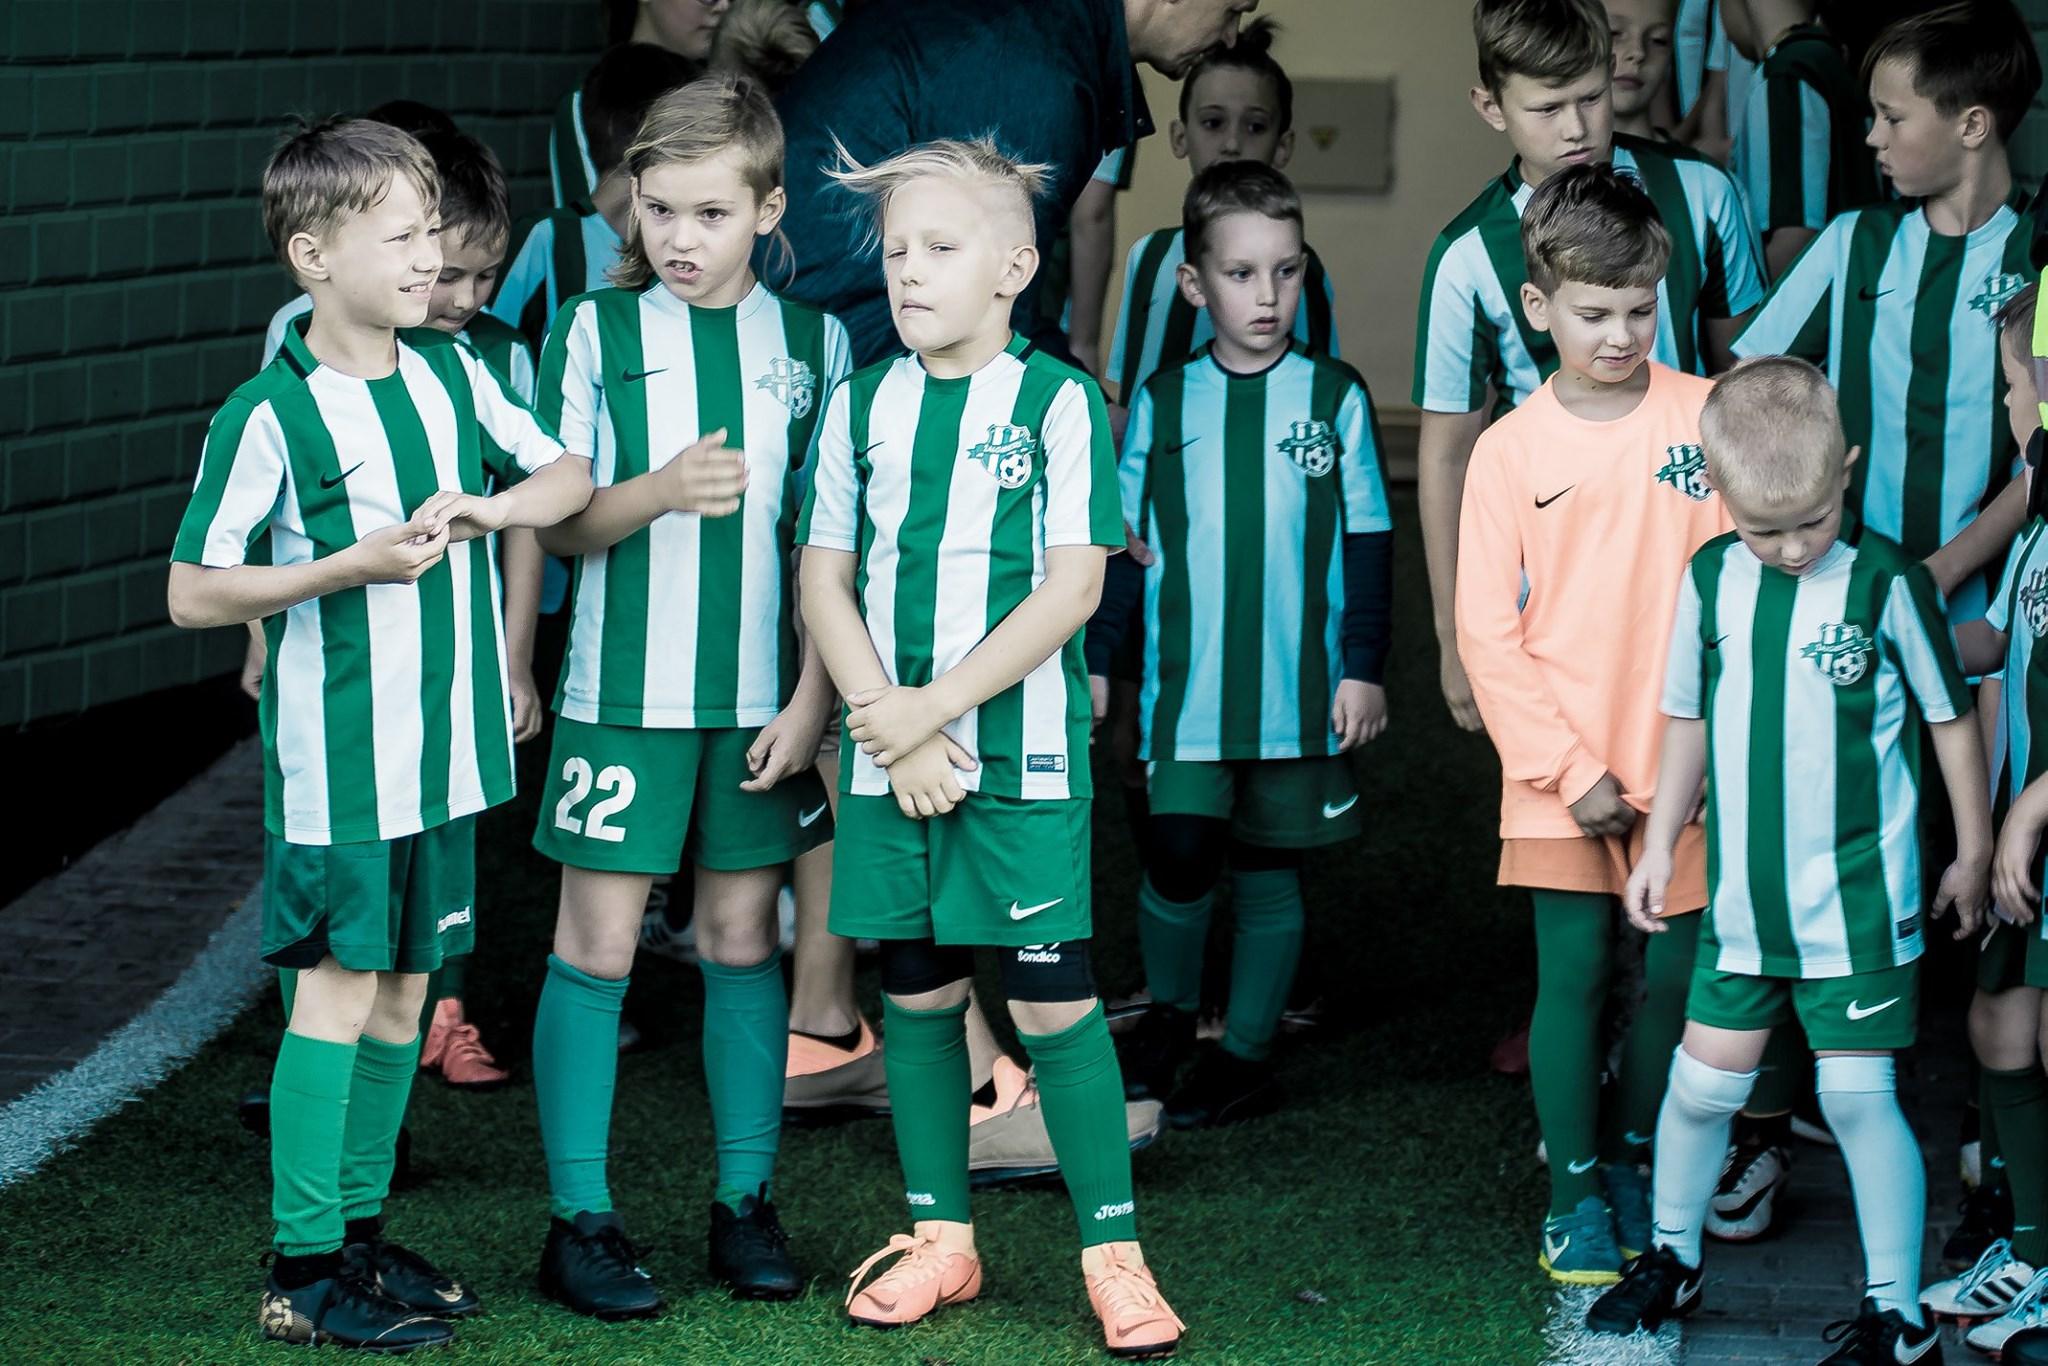 2019 07 18 UEFA Europos lyga: Žalgiris vs Honved 1:1